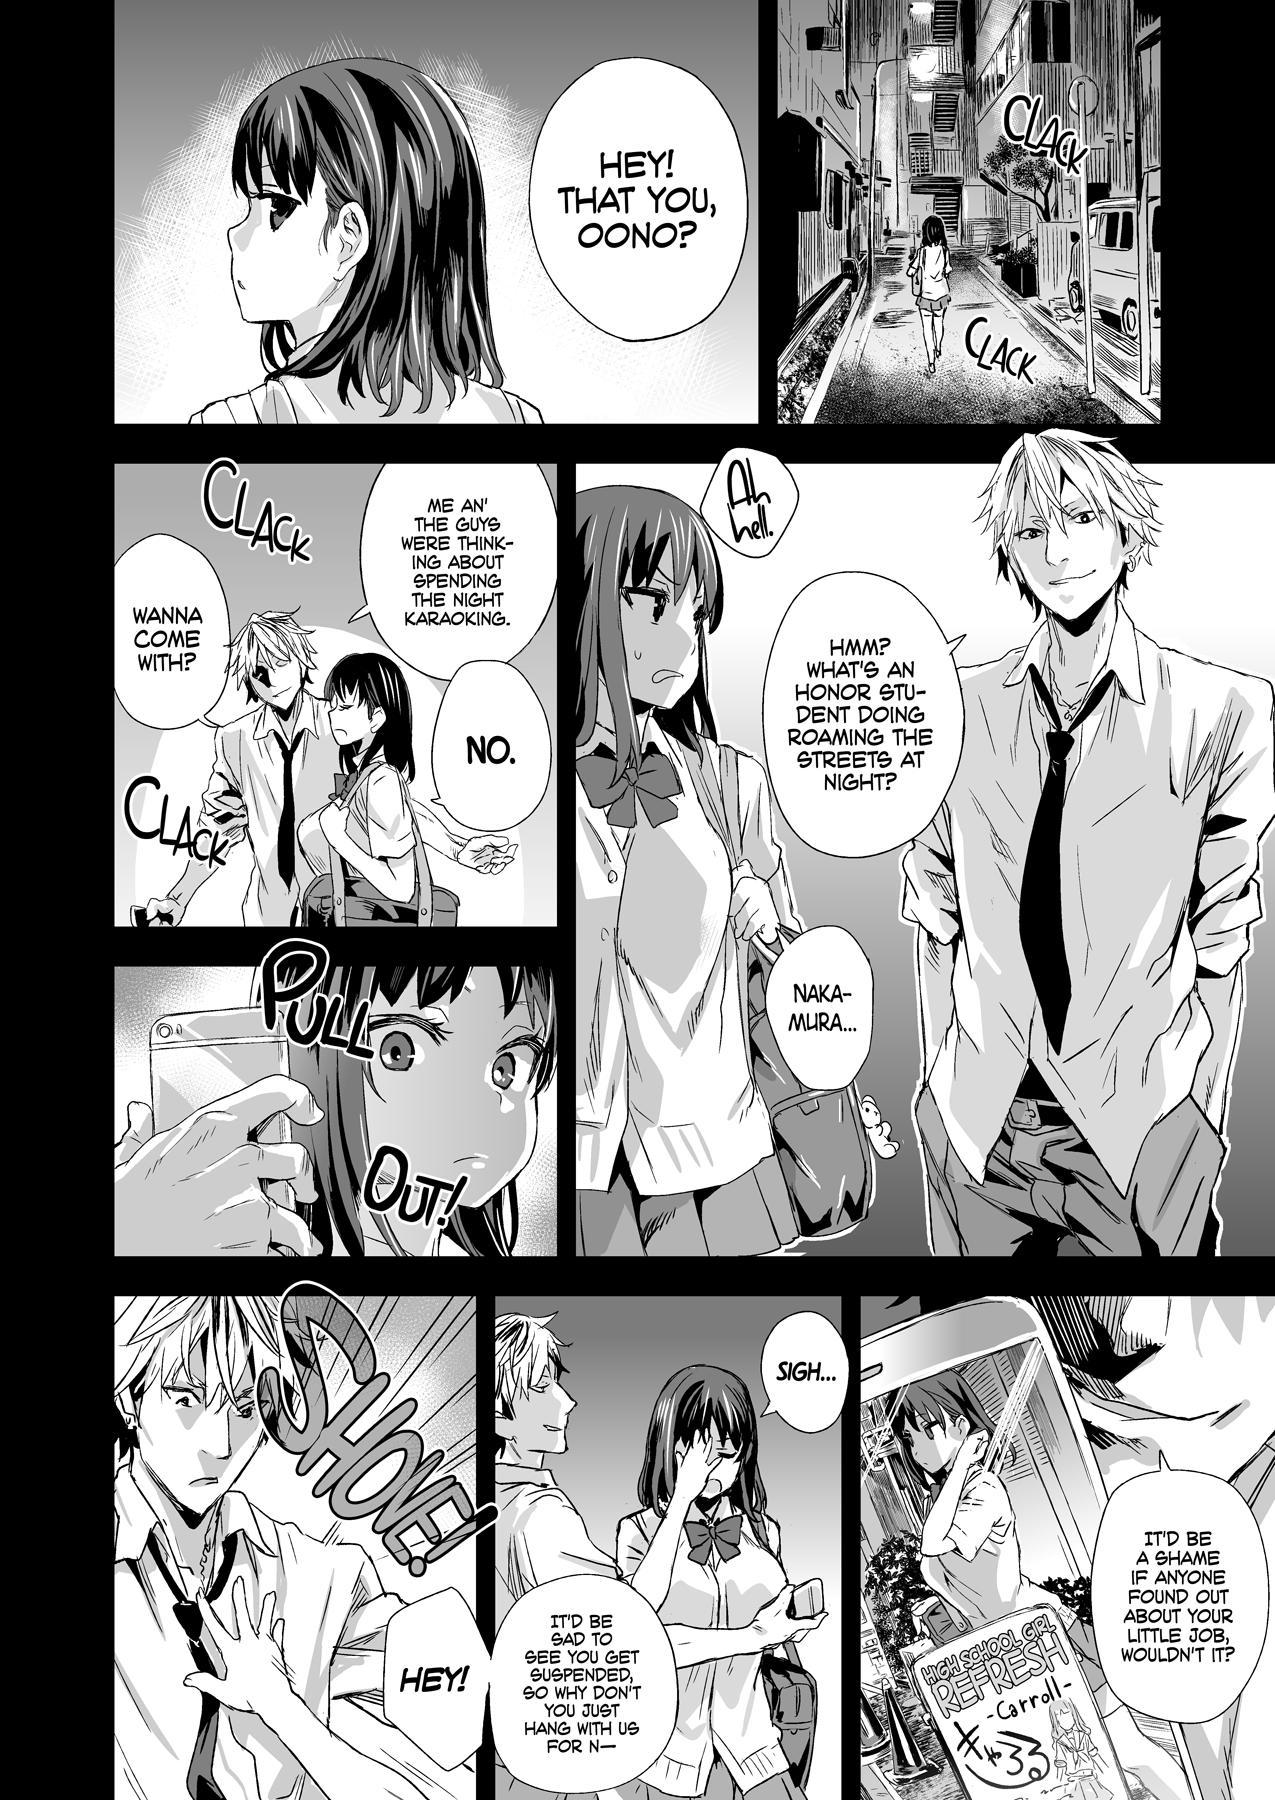 "[Fatalpulse (Asanagi)] VictimGirlsR ""JK de Refre -Flesh & Refresh-"" [English] [2D-Market.com] [Decensored] [Digital] 5"